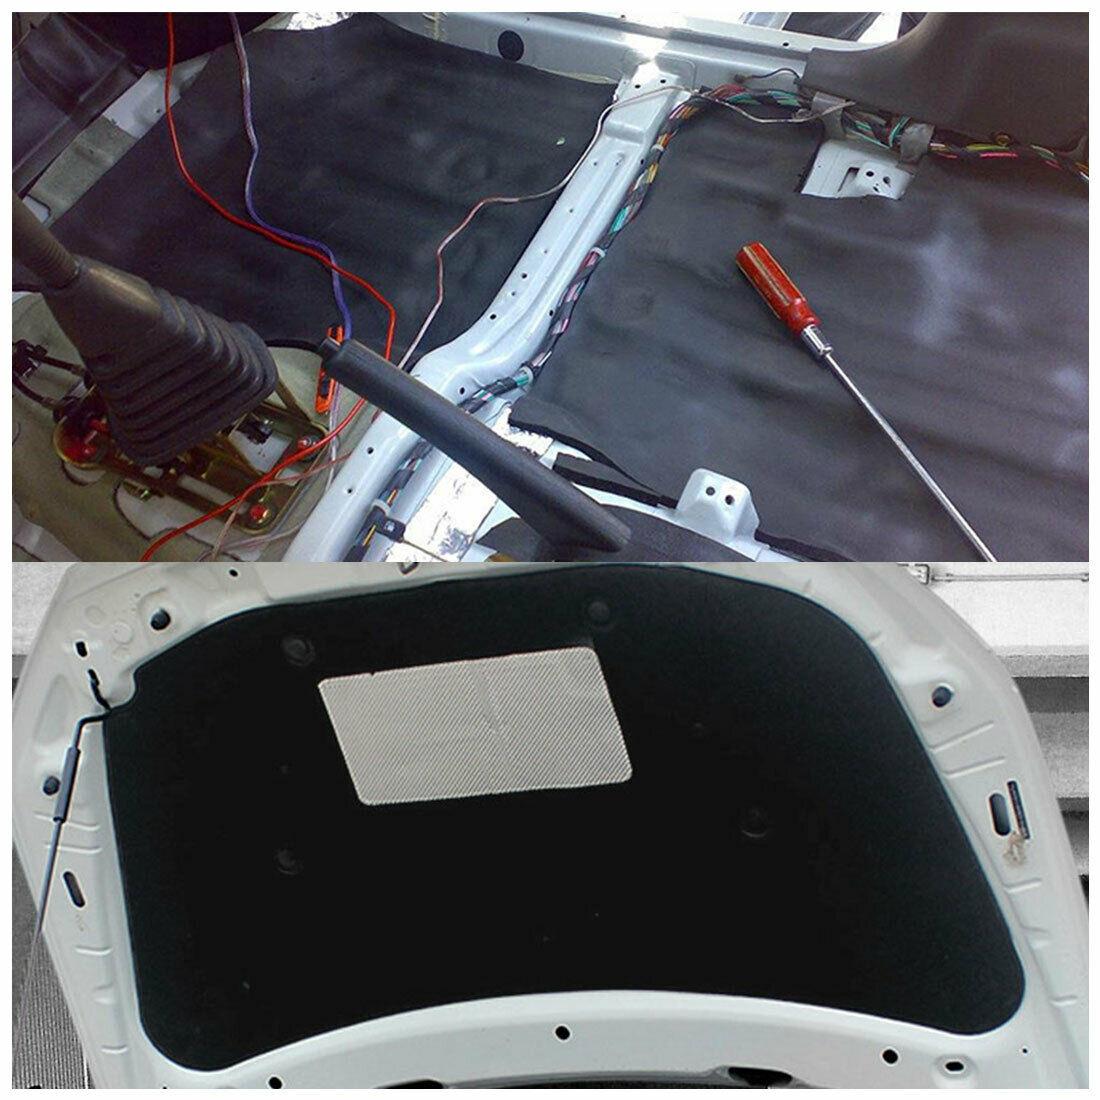 Almohadilla de 5mm con aislamiento térmico de alta reducción de ruido, almohadilla a prueba de sonido de 5mm, alfombrillas de amortiguación a prueba de sonido con aislamiento térmico estéreo para coche Auriculares inalámbricos Sabbat E12 Ultra QCC3020 TWS con Bluetooth 5,0, auriculares estéreo inalámbricos con reducción de ruido, auriculares con carga inalámbrica